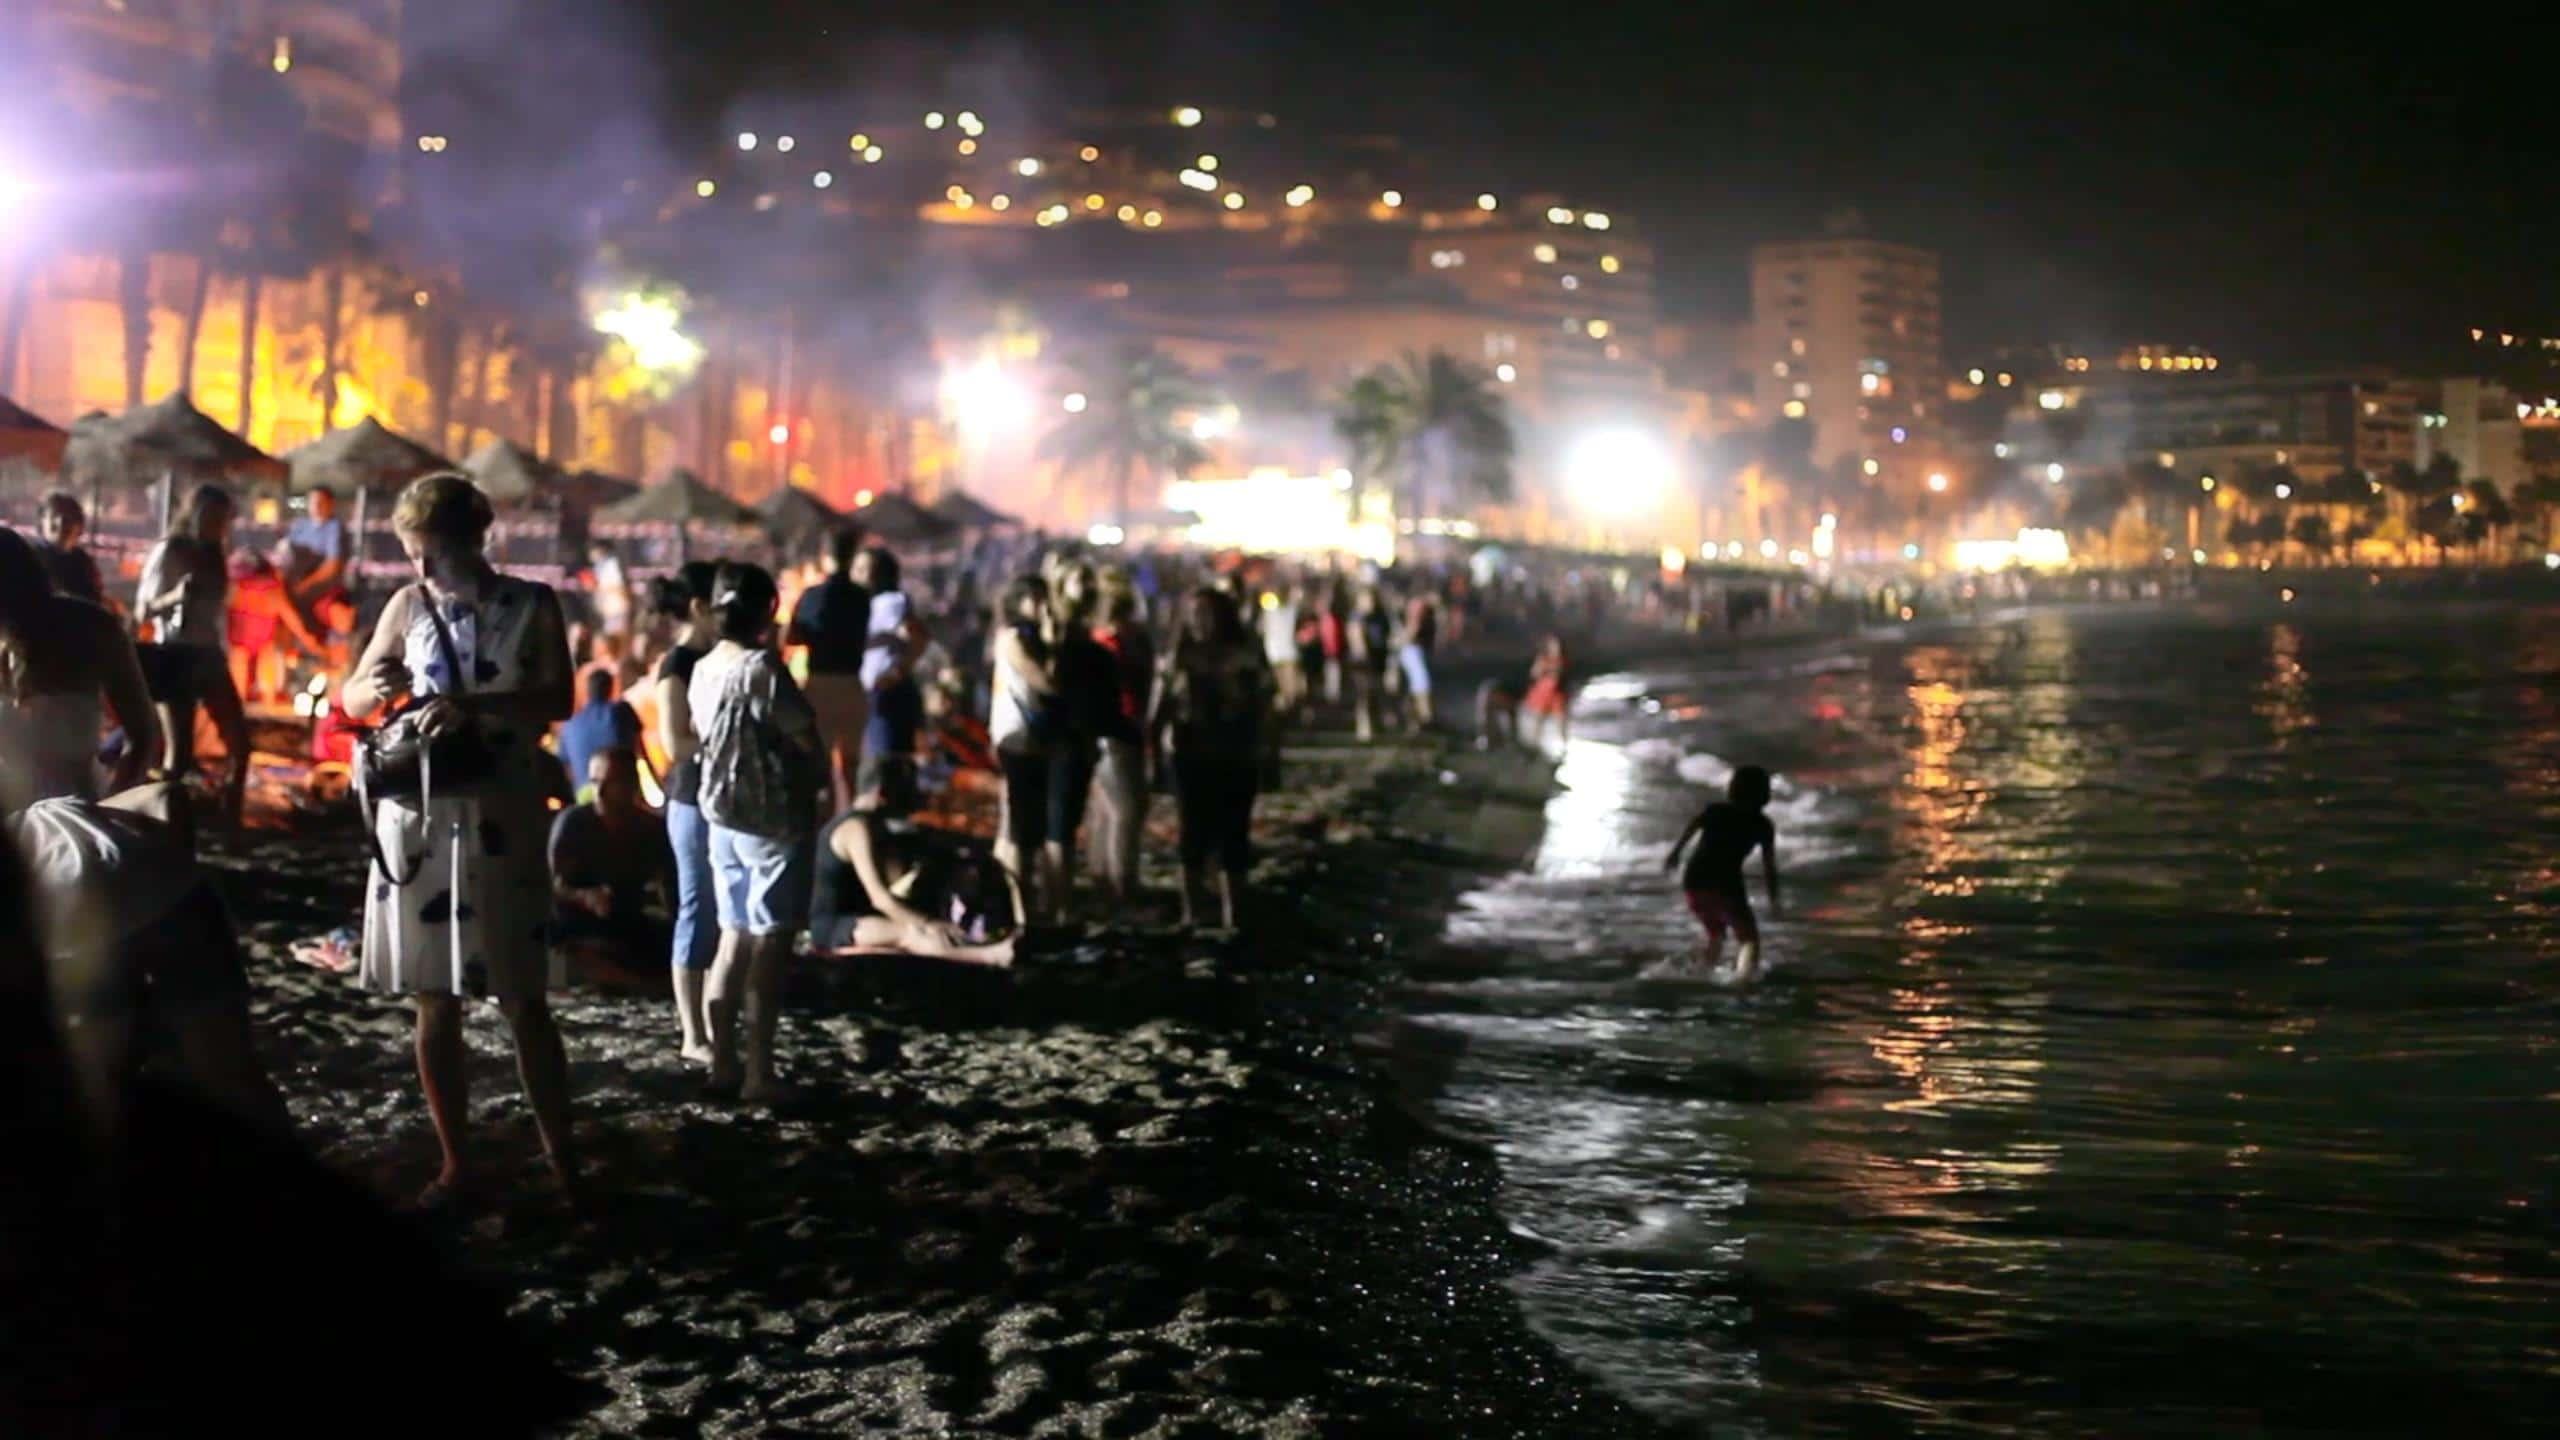 La noche de San Juan en Espagne